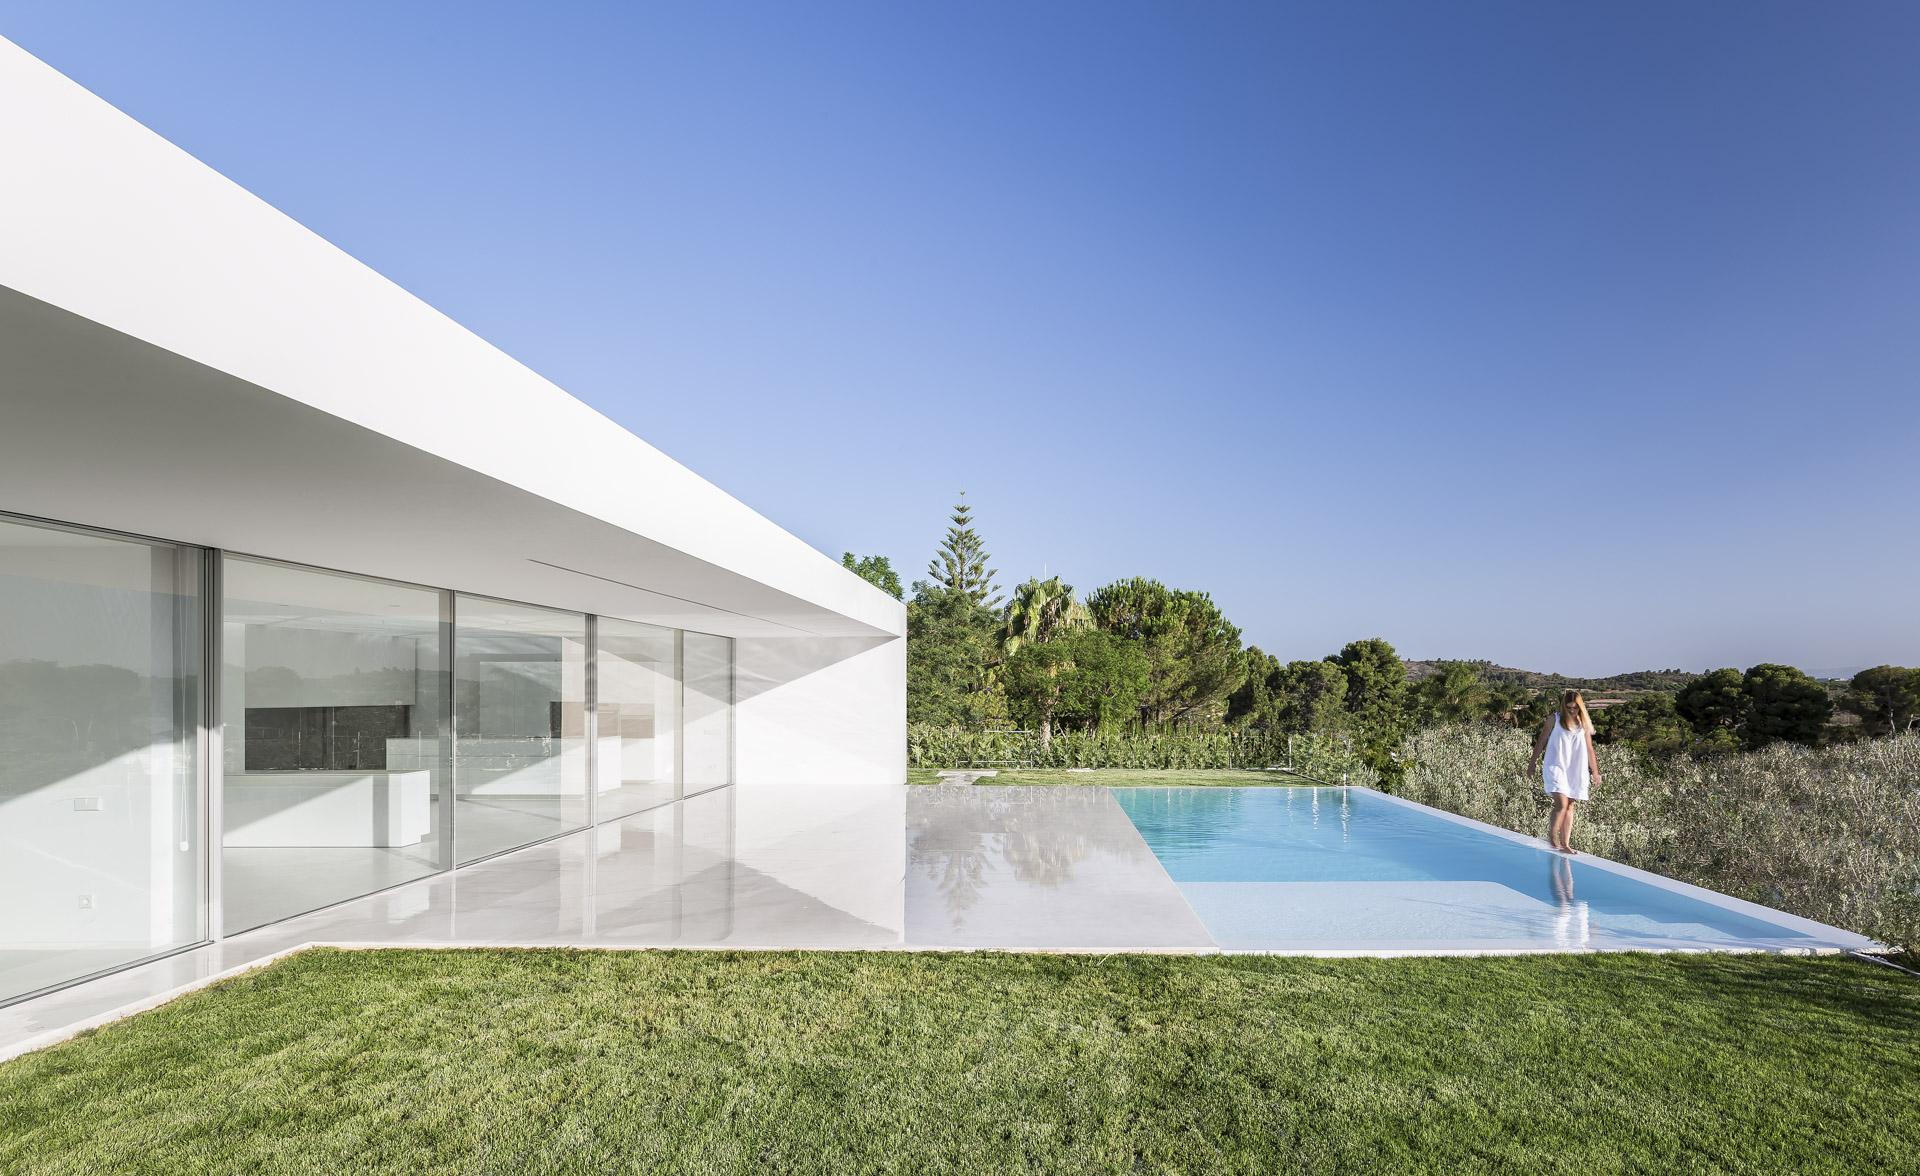 fotografia-arquitectura-valencia-german-cabo-gallardo-llopis-villamarchante-vivienda-34